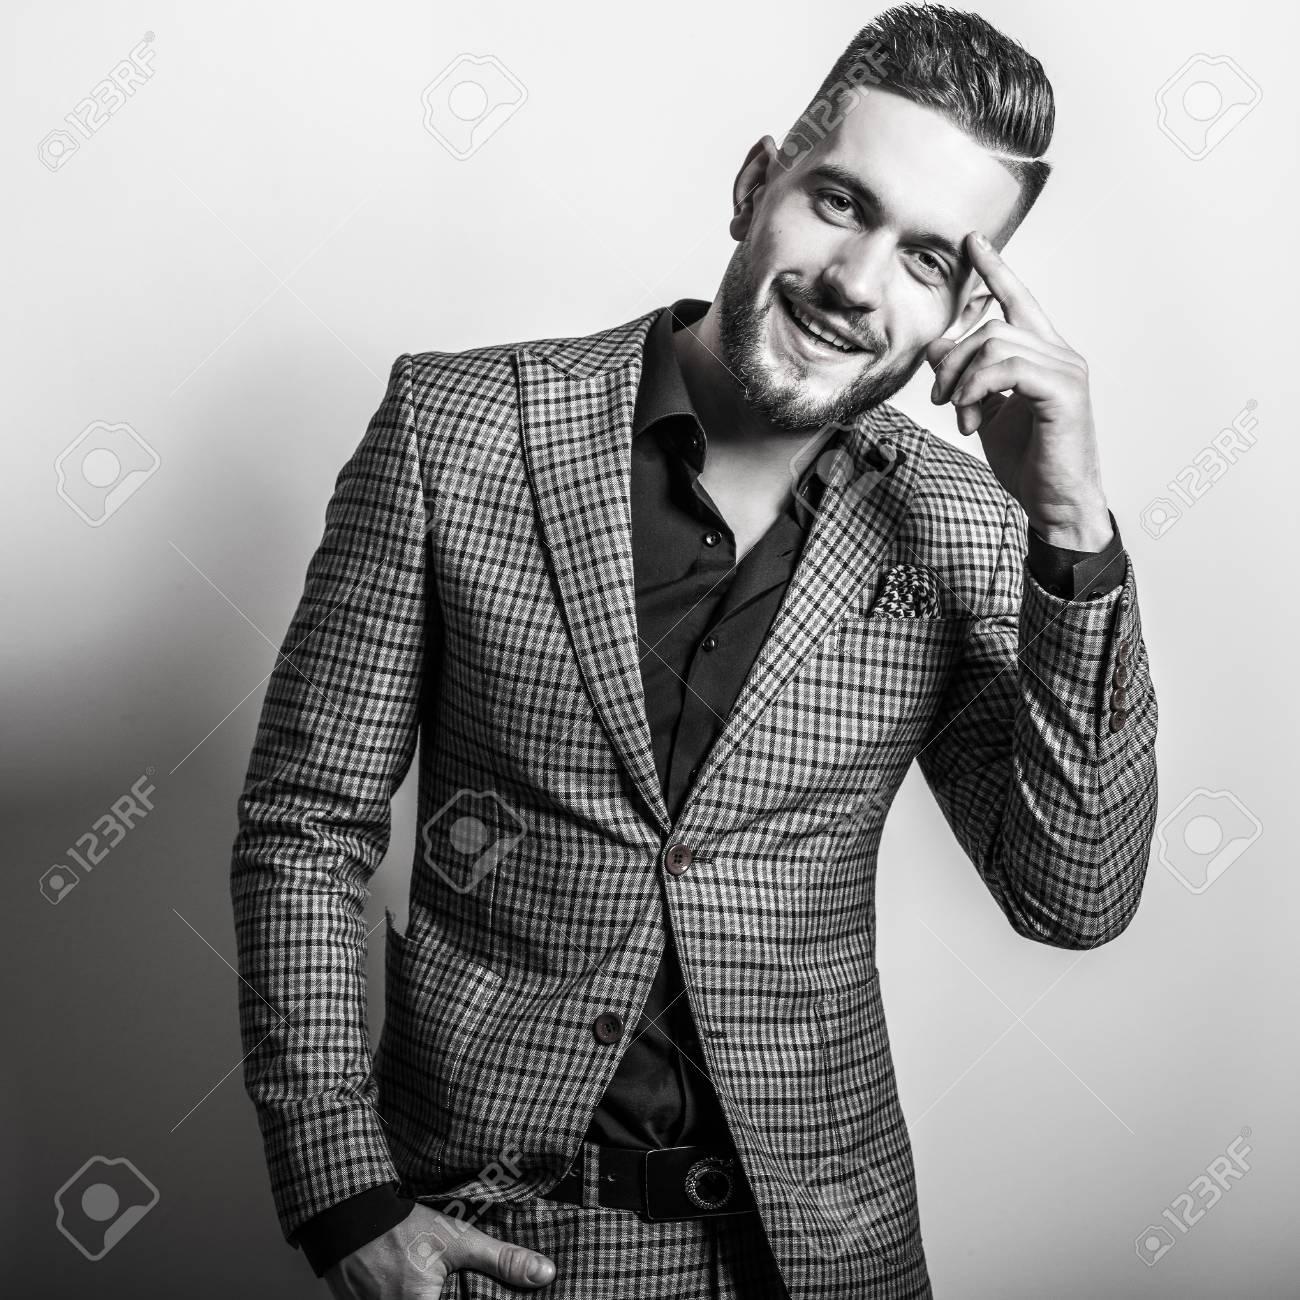 Handsome young elegant man in grey jacket pose against studio background black white portrait